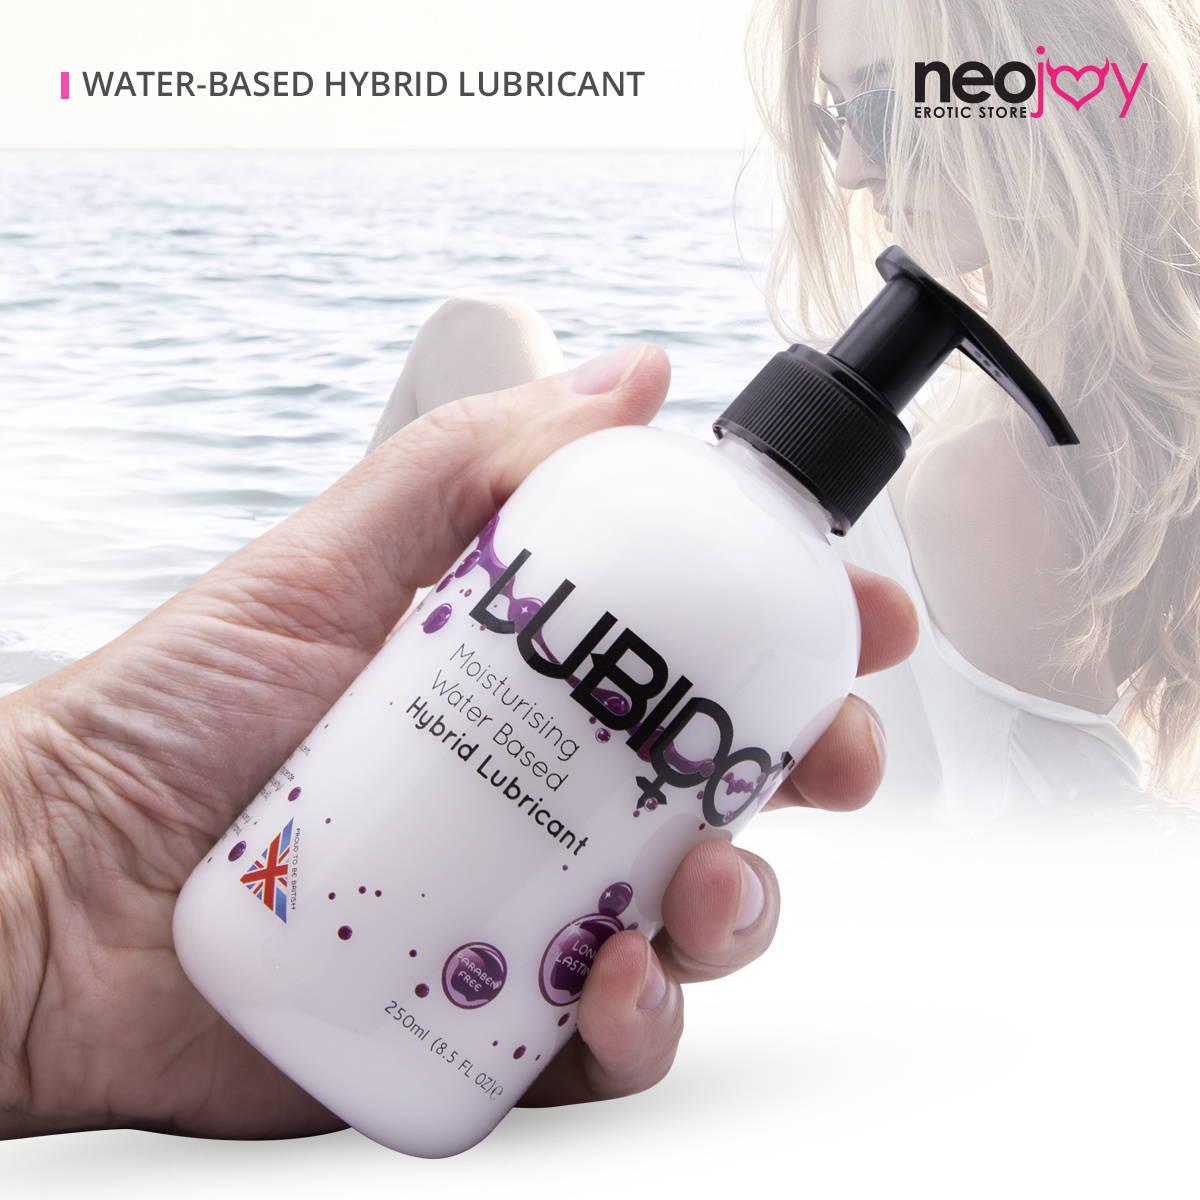 hybrid lubricant